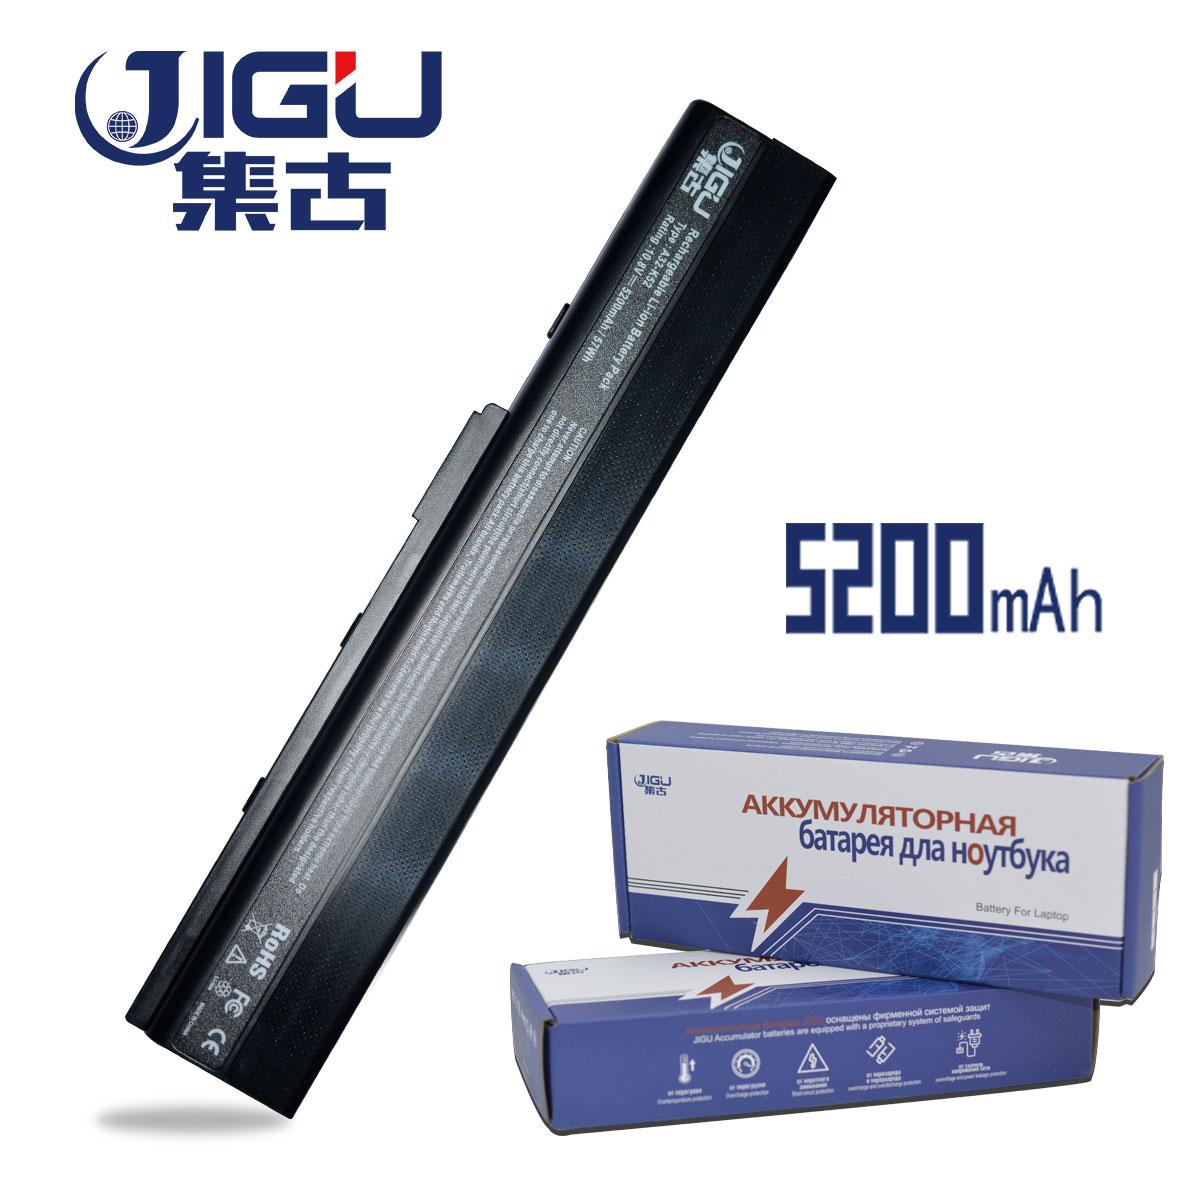 JIGU High Qualiy Laptop Battery For Asus K52J K52JB K52JC K52JE K52JK K52JR K52N K52D K52DE K52DR K52F K62 K62F K62J K62JR N82 for asus k52 x52j a52j k52j k52jr k52jt k52jb k52ju k52je k52d x52d a52d k52dy k52de k52dr audio usb io board interface board